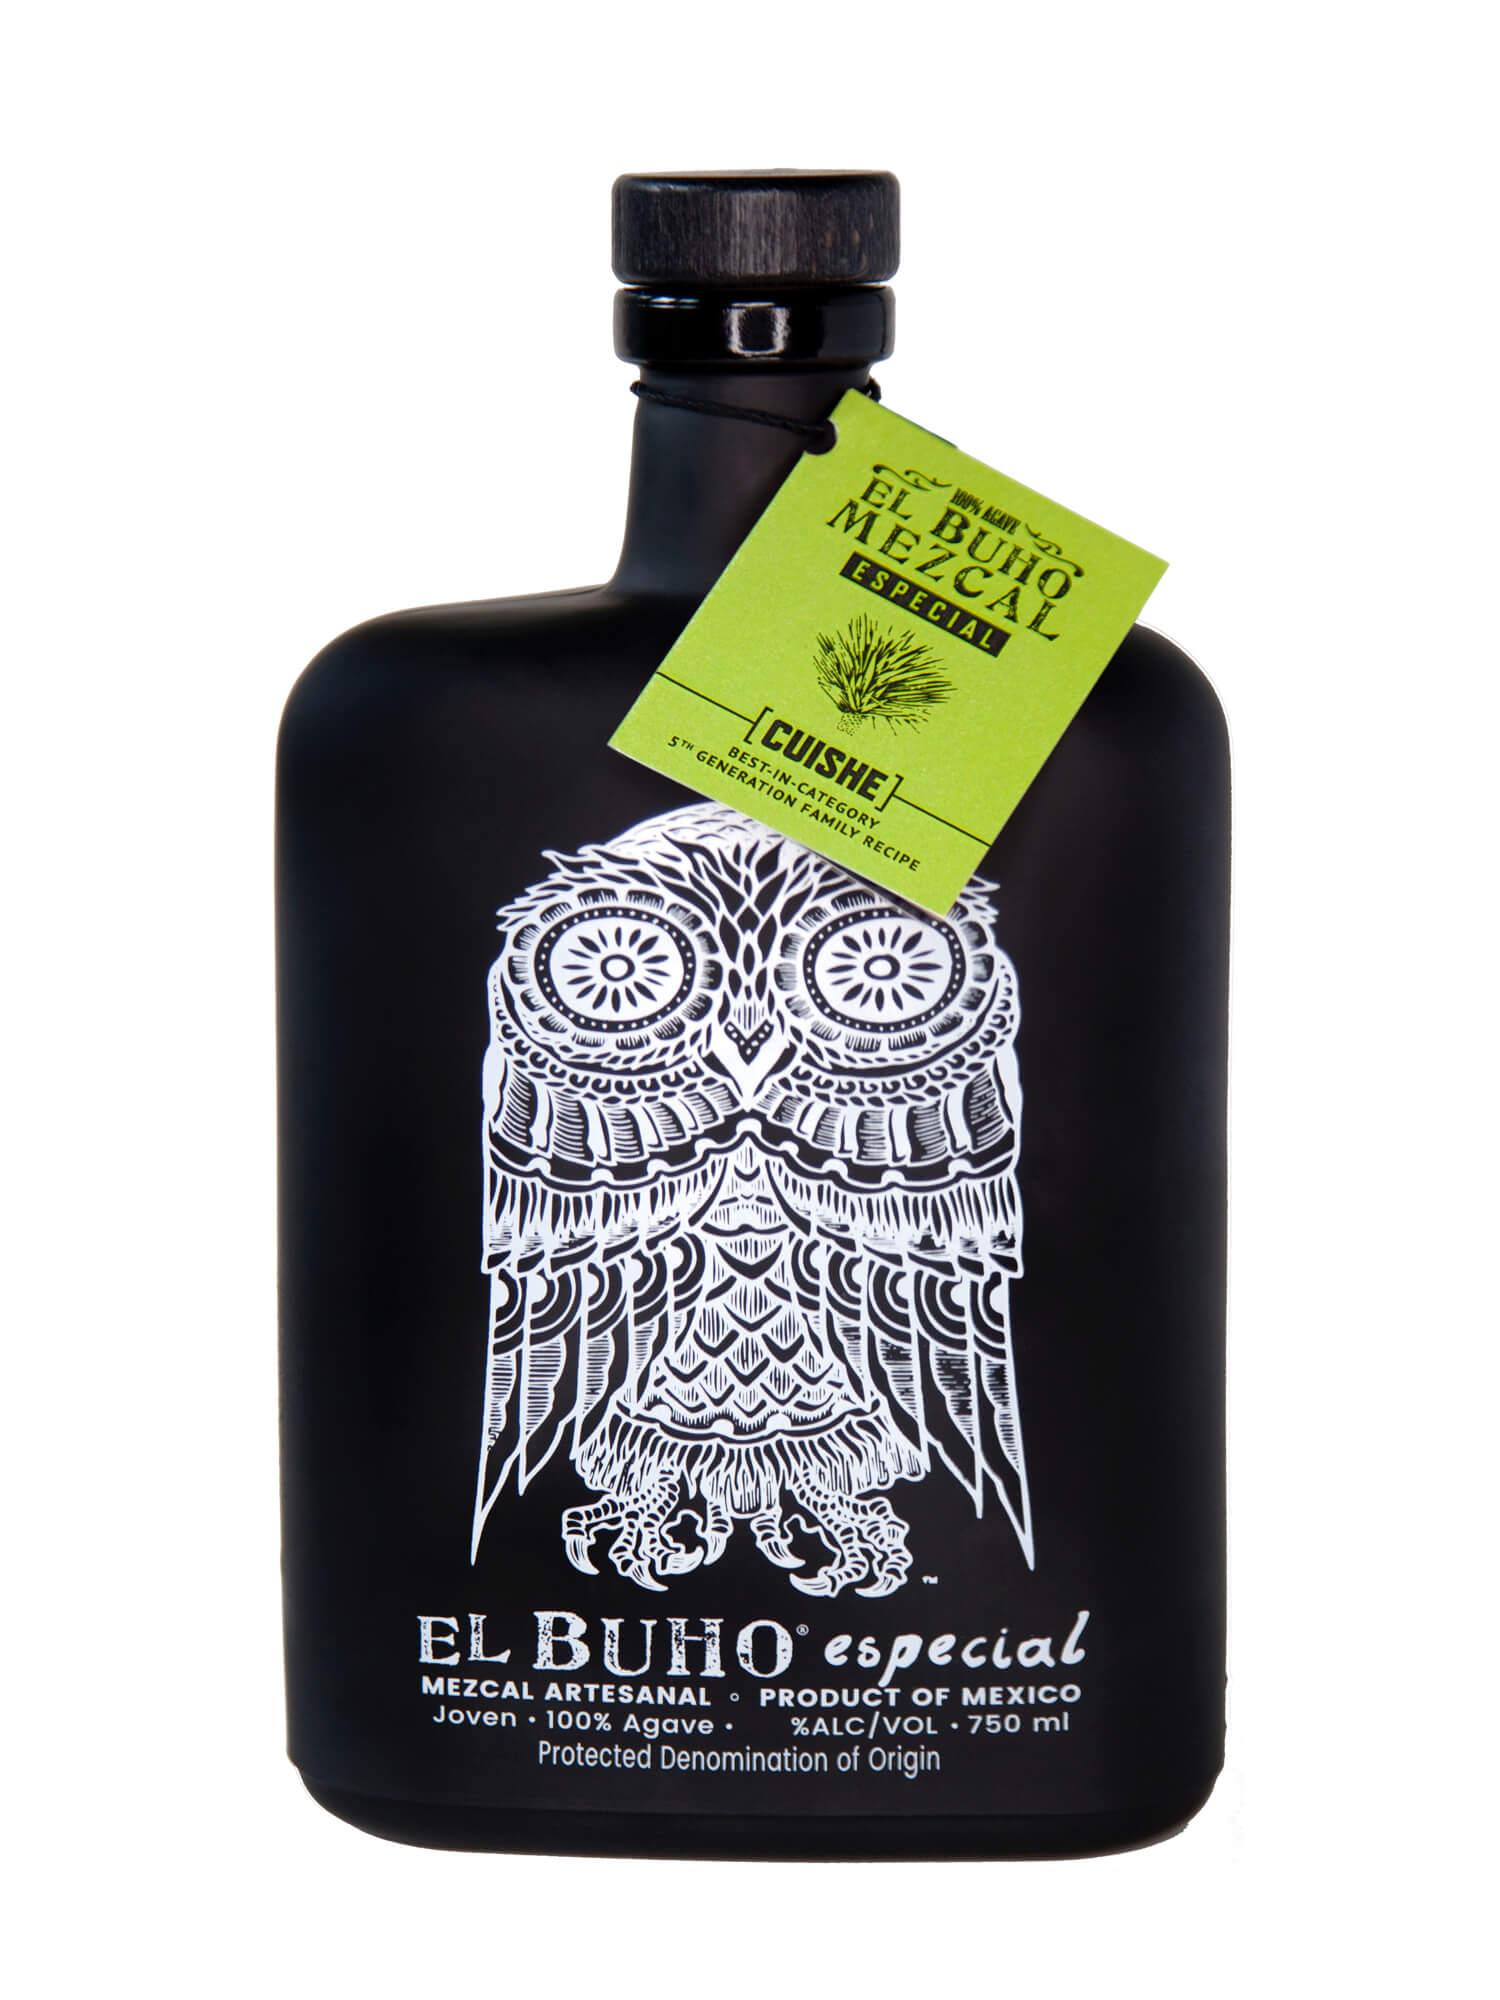 El Buho Cuishe Mezcal bottle